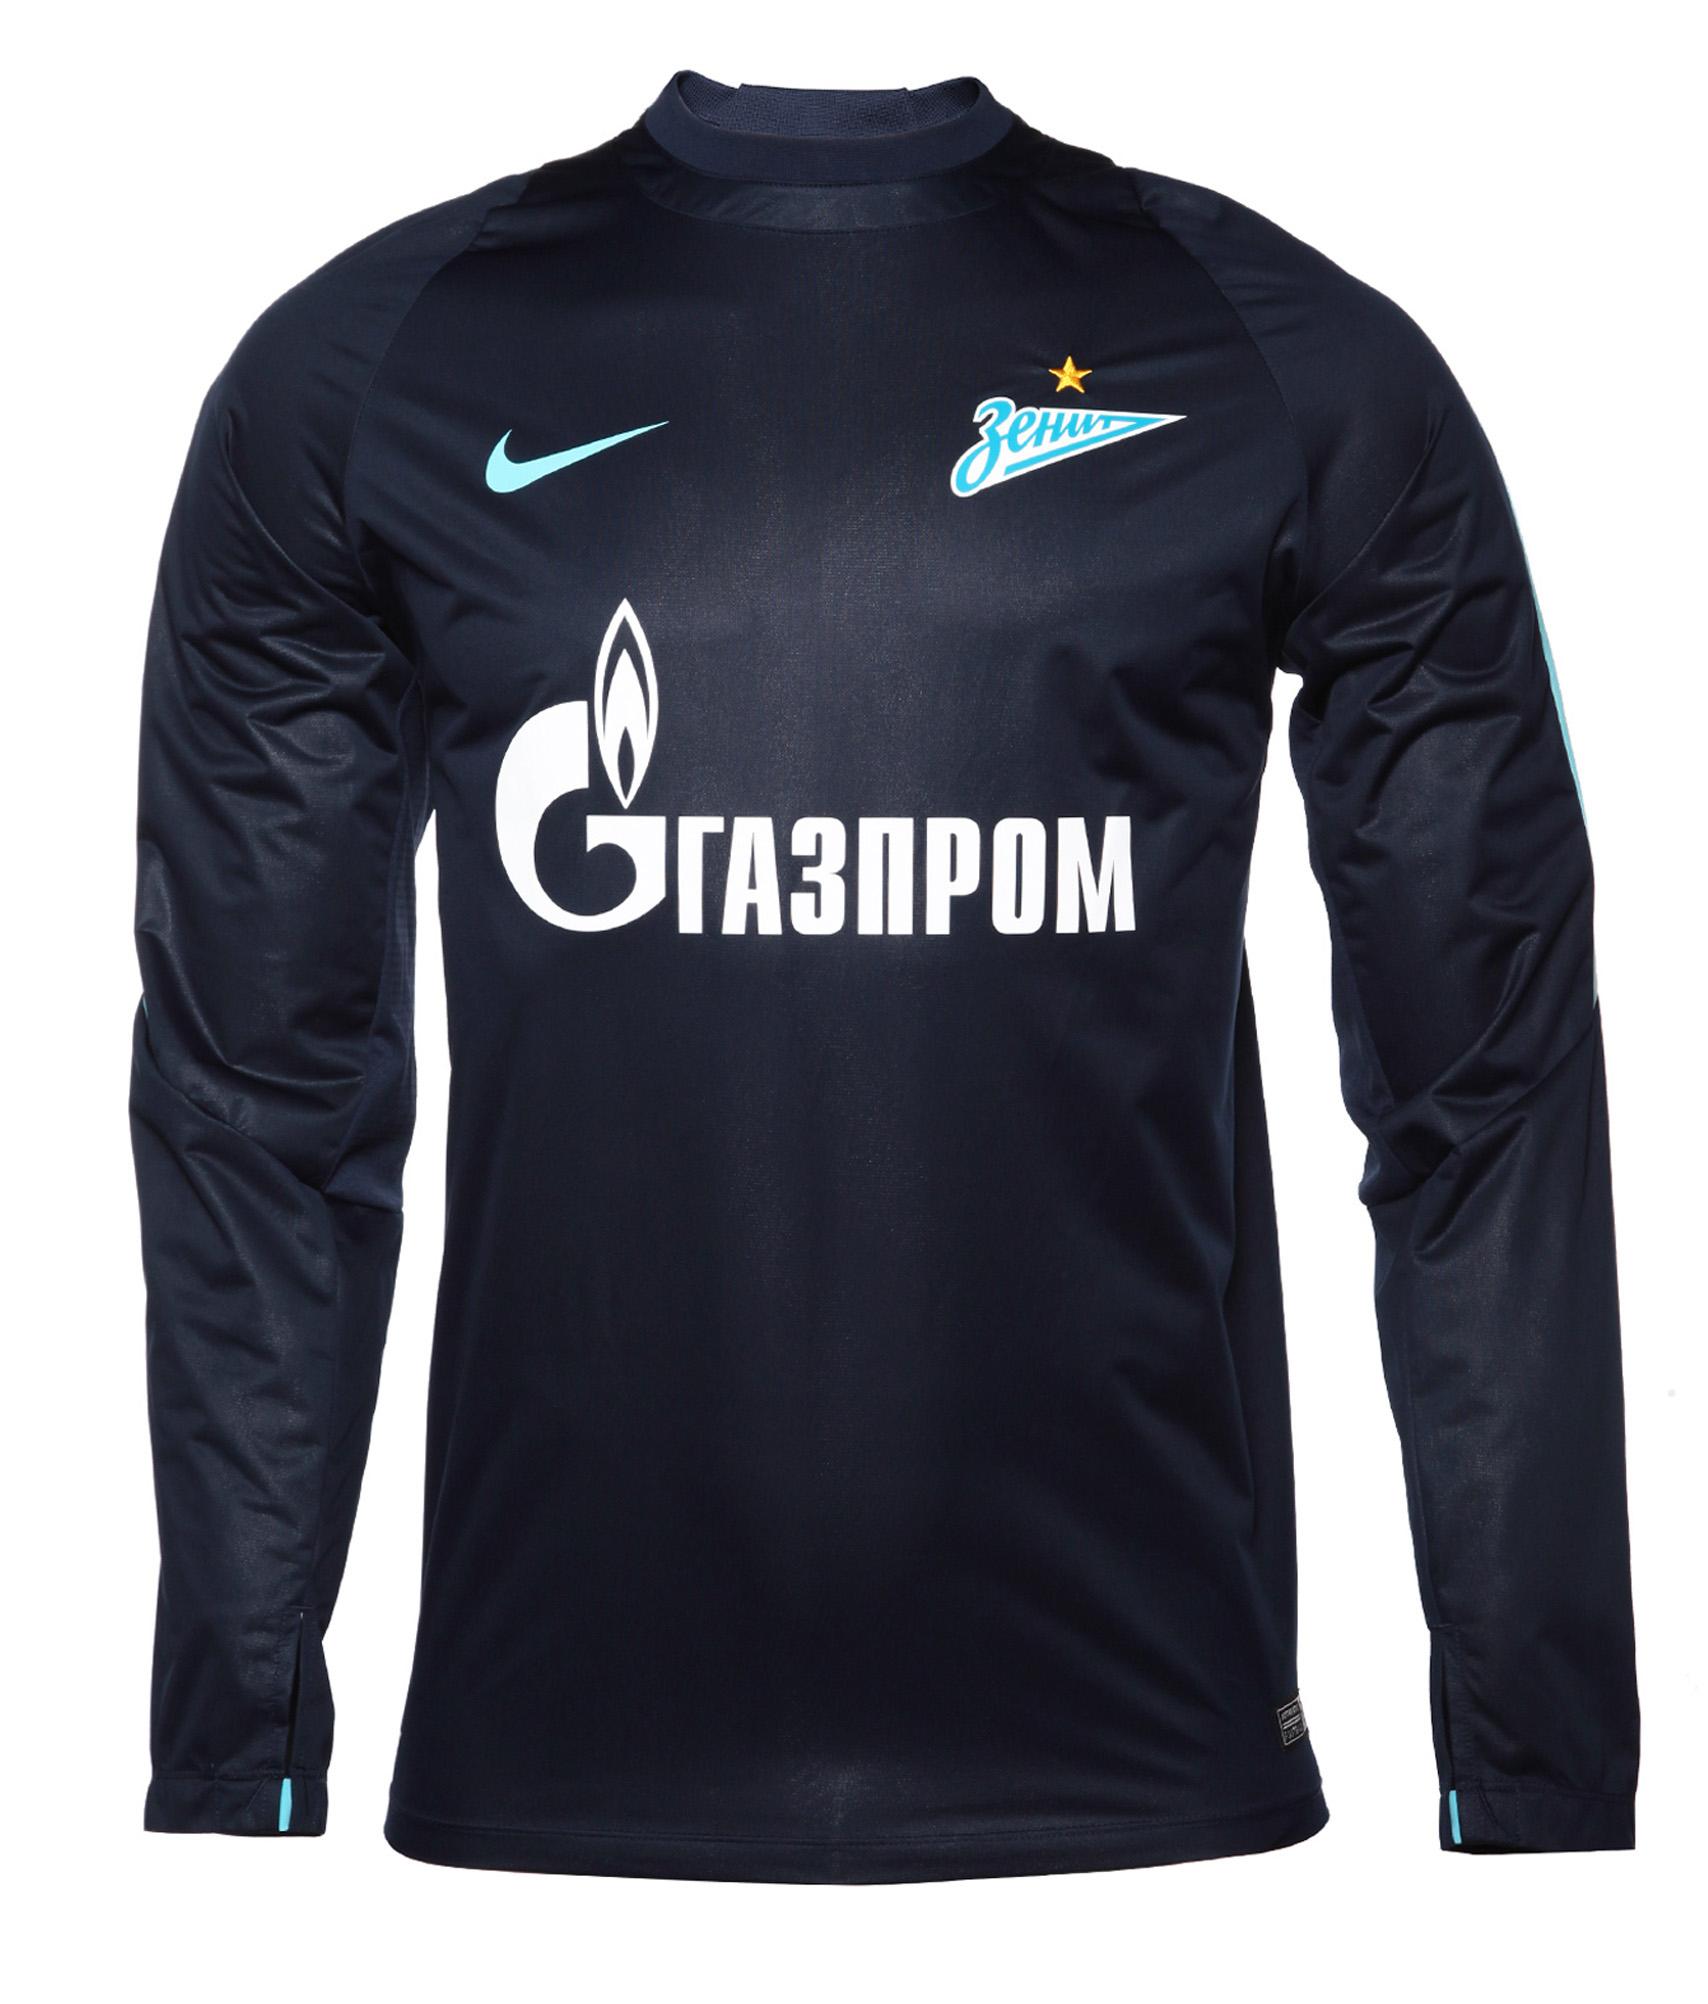 Джемпер тренировочный Nike Nike Цвет-Синий джемперы nike джемпер nike element sphere 1 2 zip